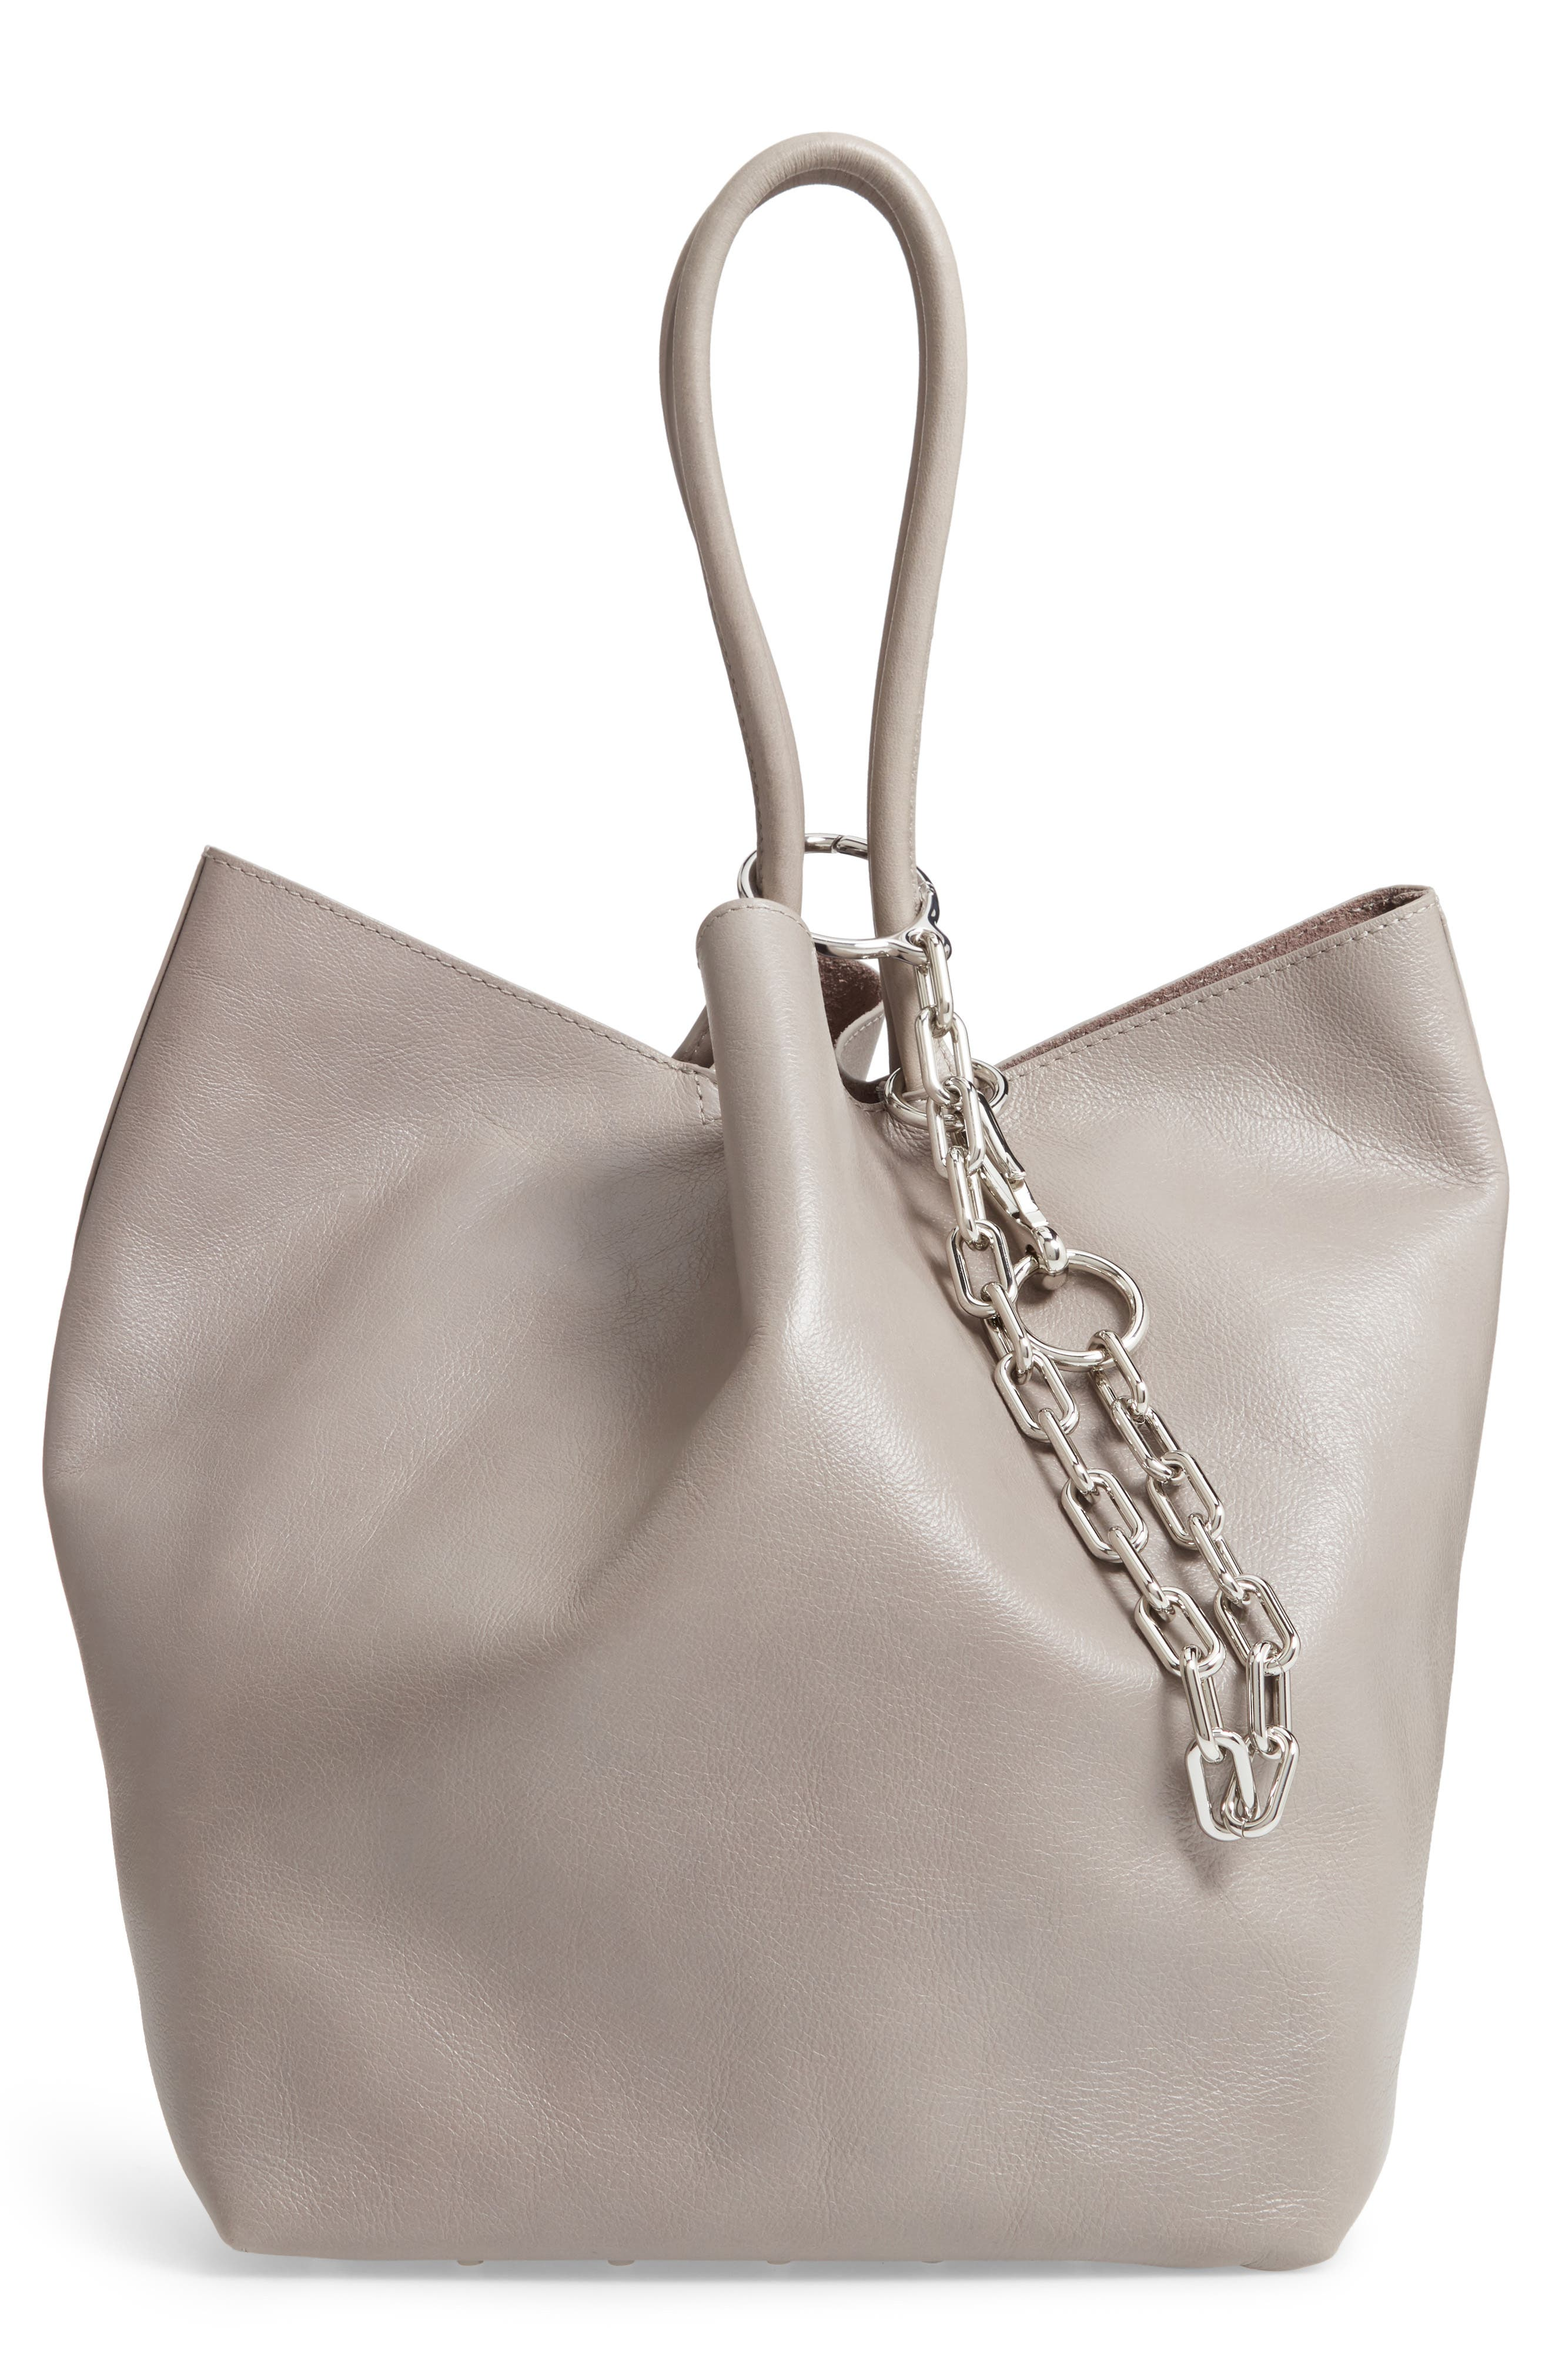 Roxy Large Leather Tote Bag,                             Main thumbnail 1, color,                             SLATE